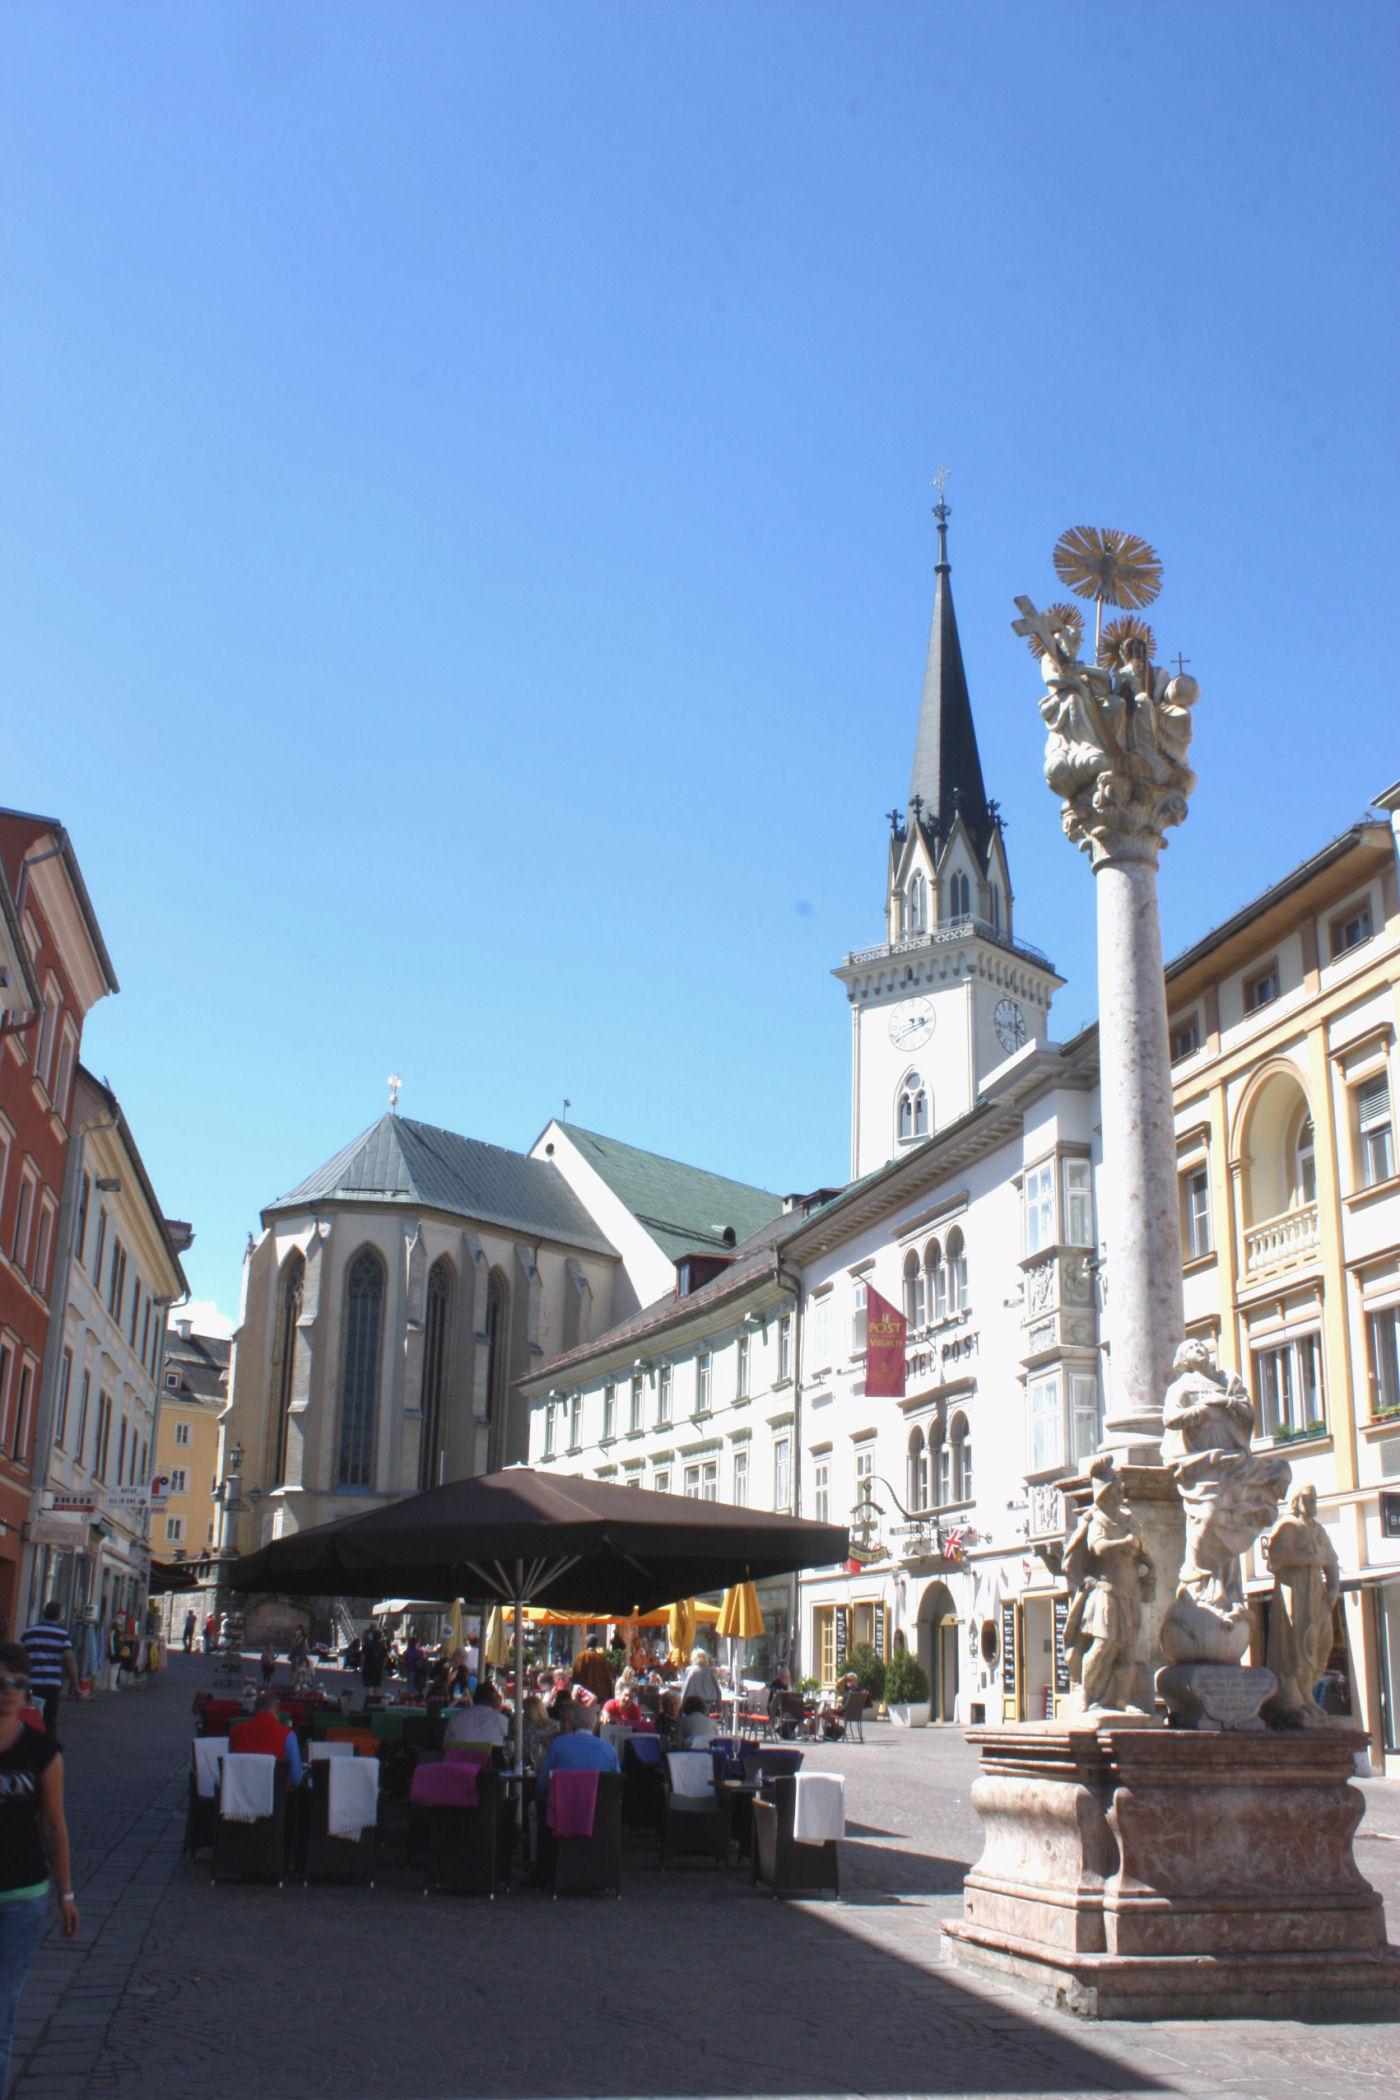 Villach has a Trinity Column dates from 1739, Carinthia, Austria